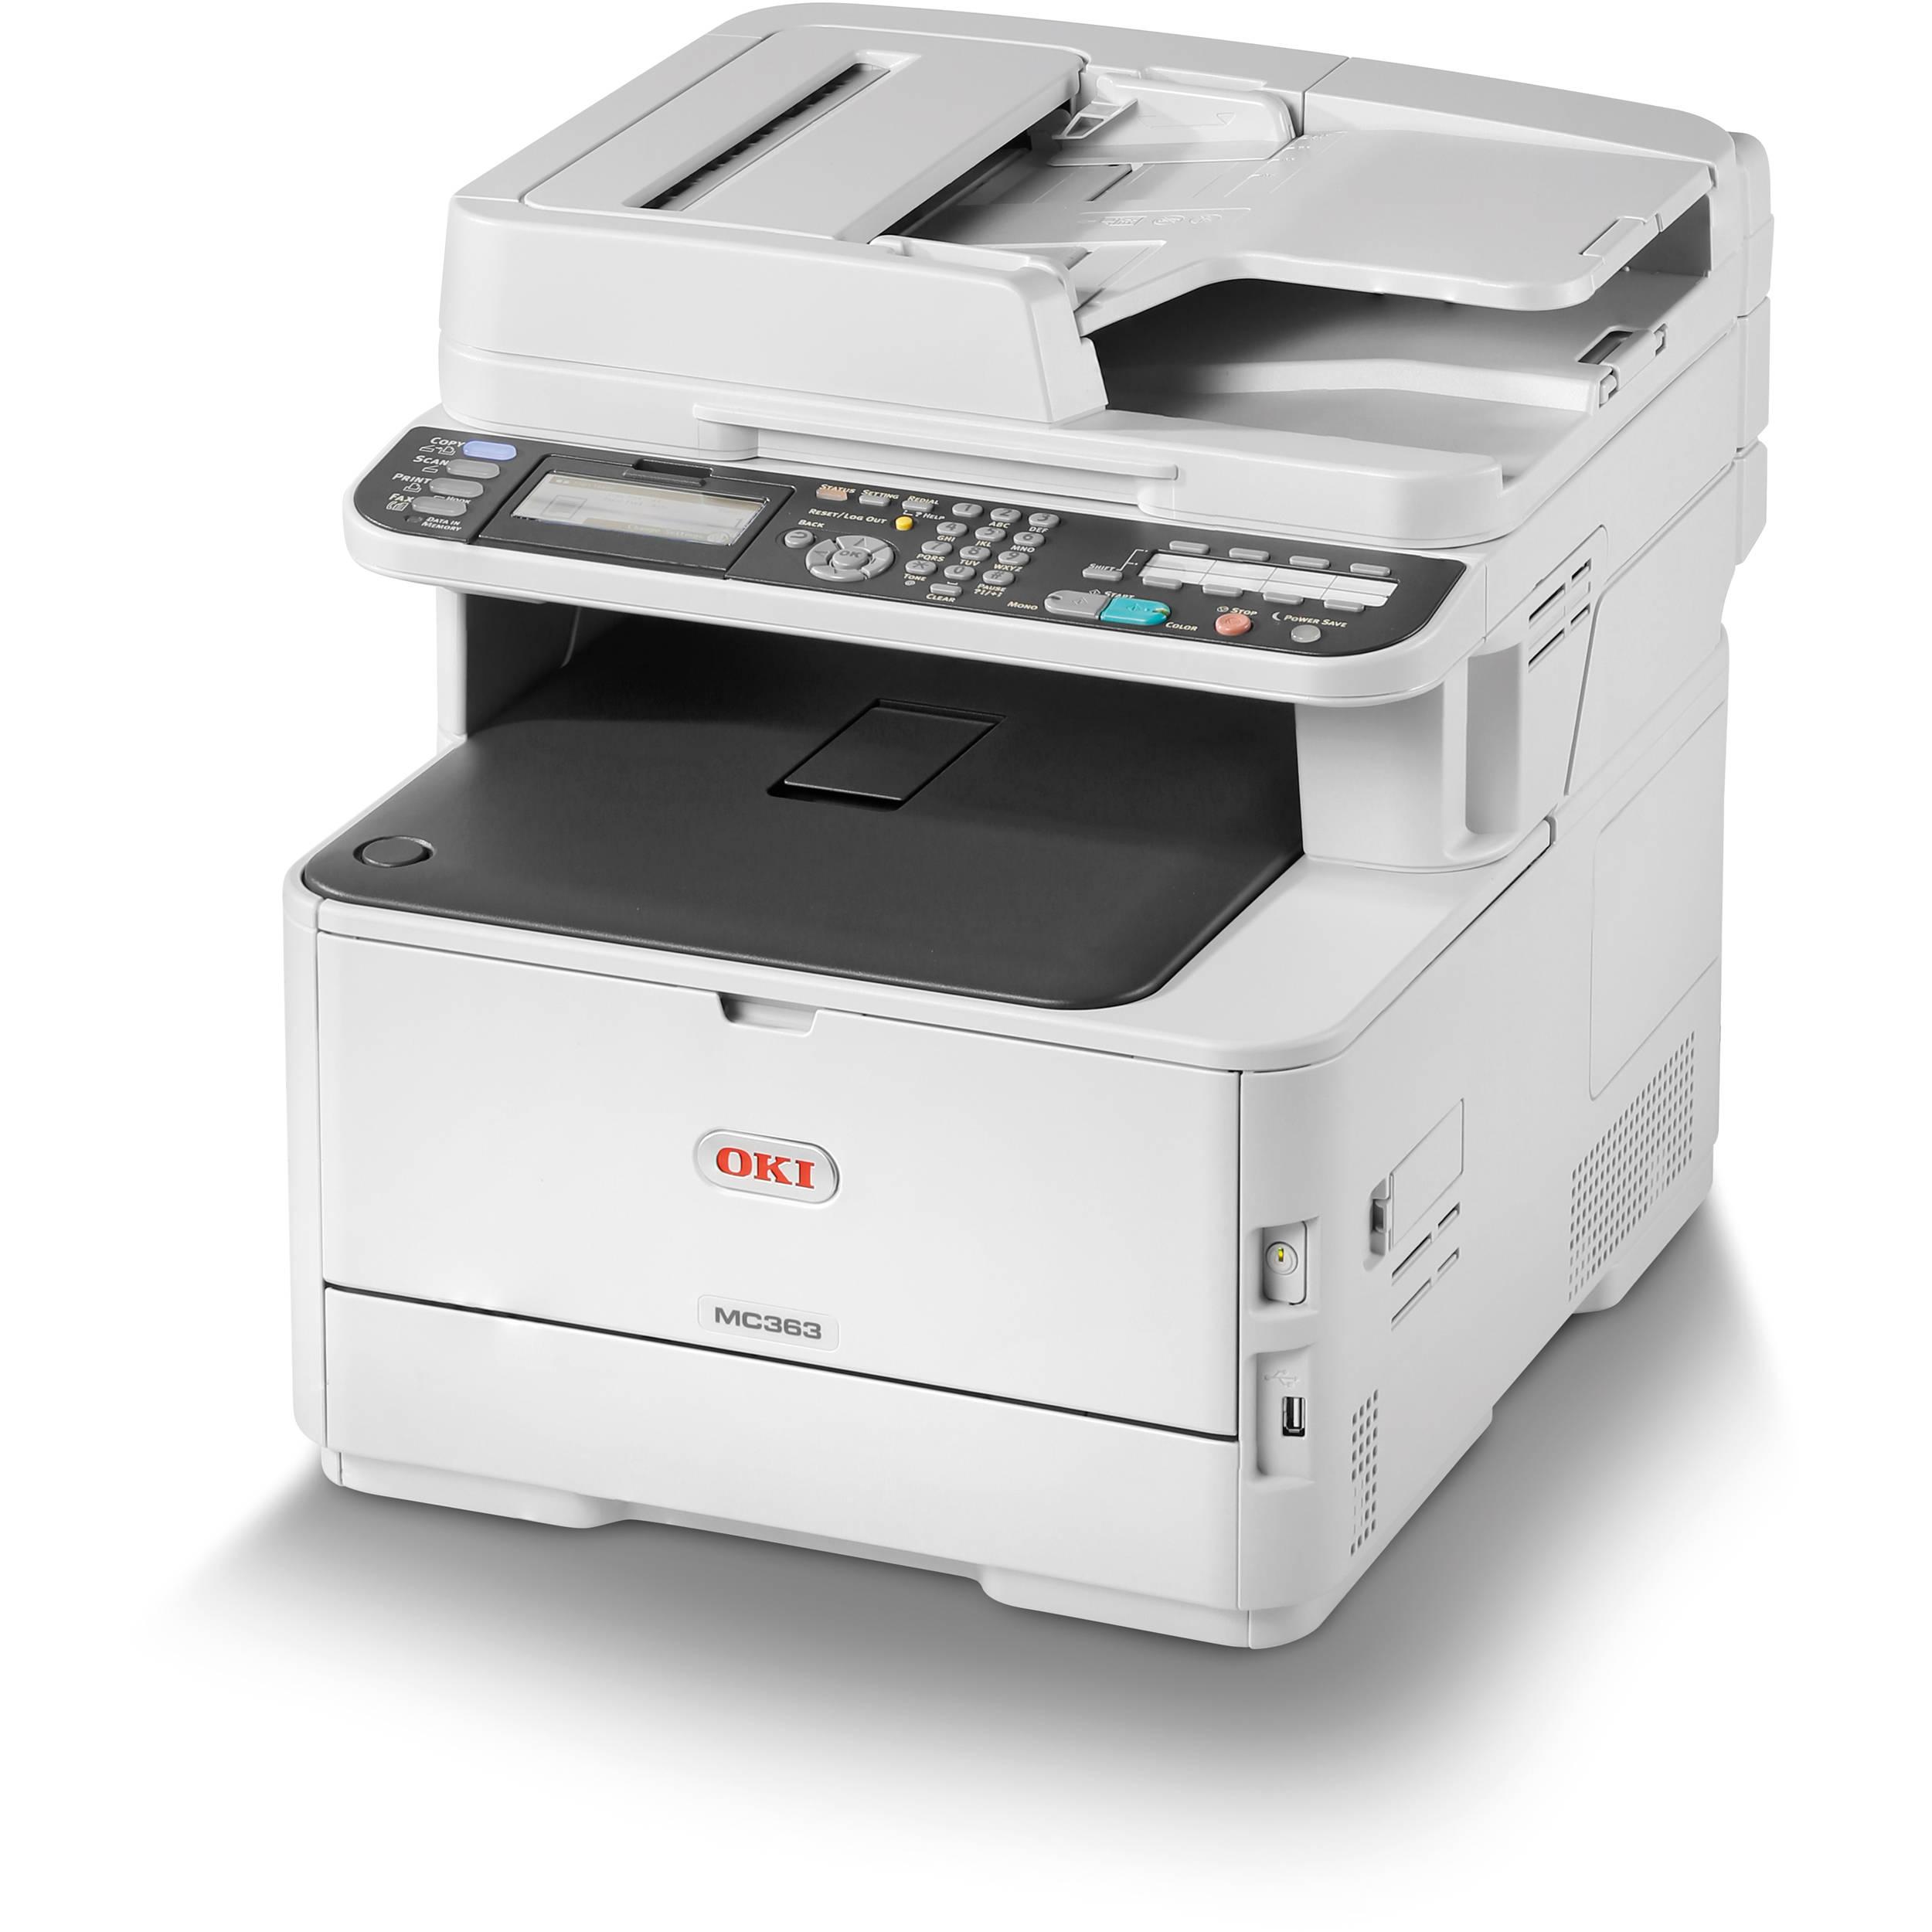 SINDOH N515 XPS Printer Mac